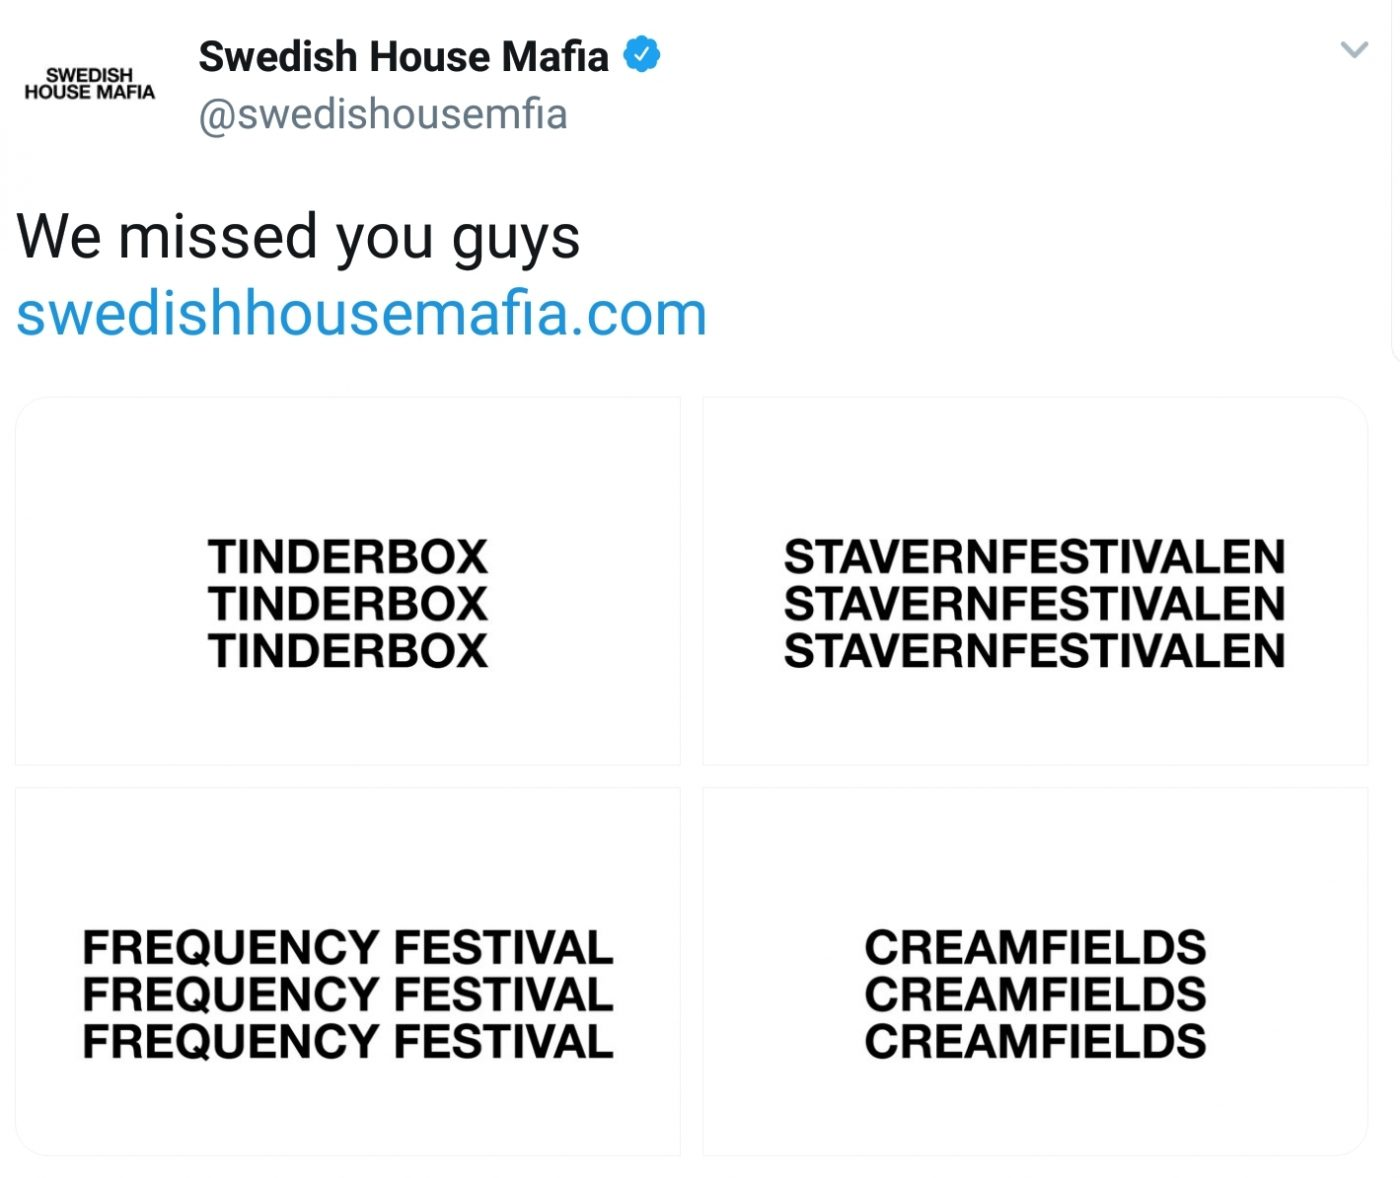 WhatsApp-Image-2018-11-28-at-10.06.10 8 fechas confirmadas para la gira SHM 2019